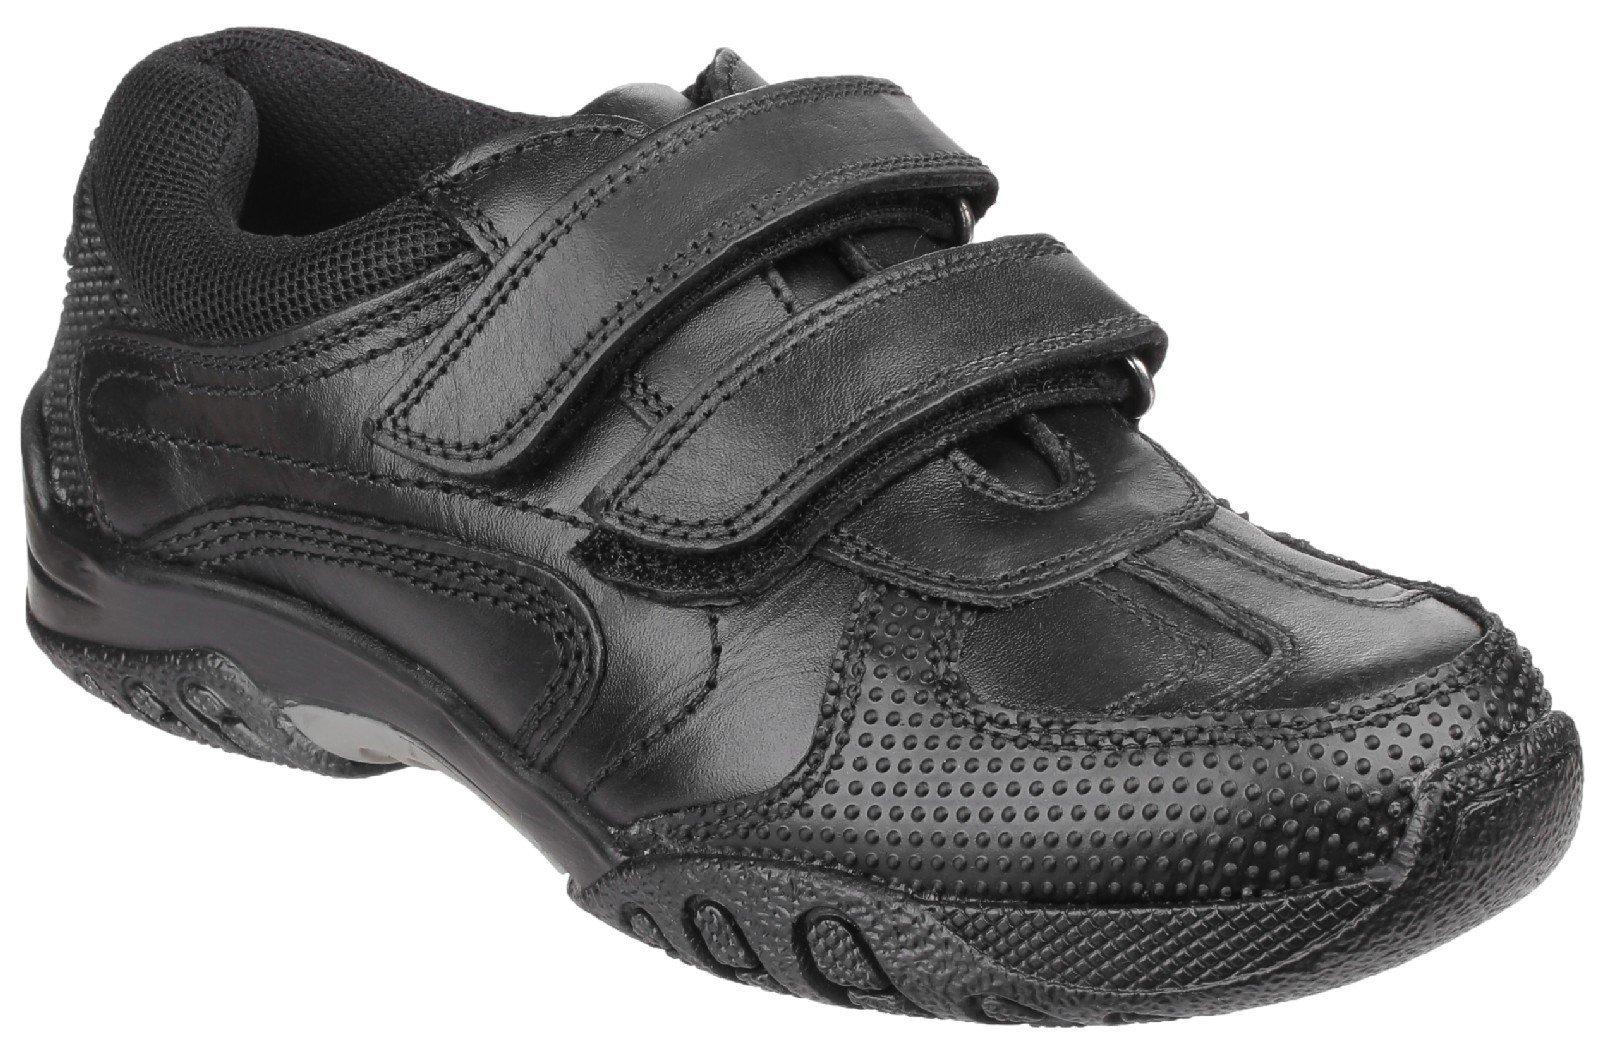 Hush Puppies Kid's Jezza Back To School Shoe Black 25342 - Black 10